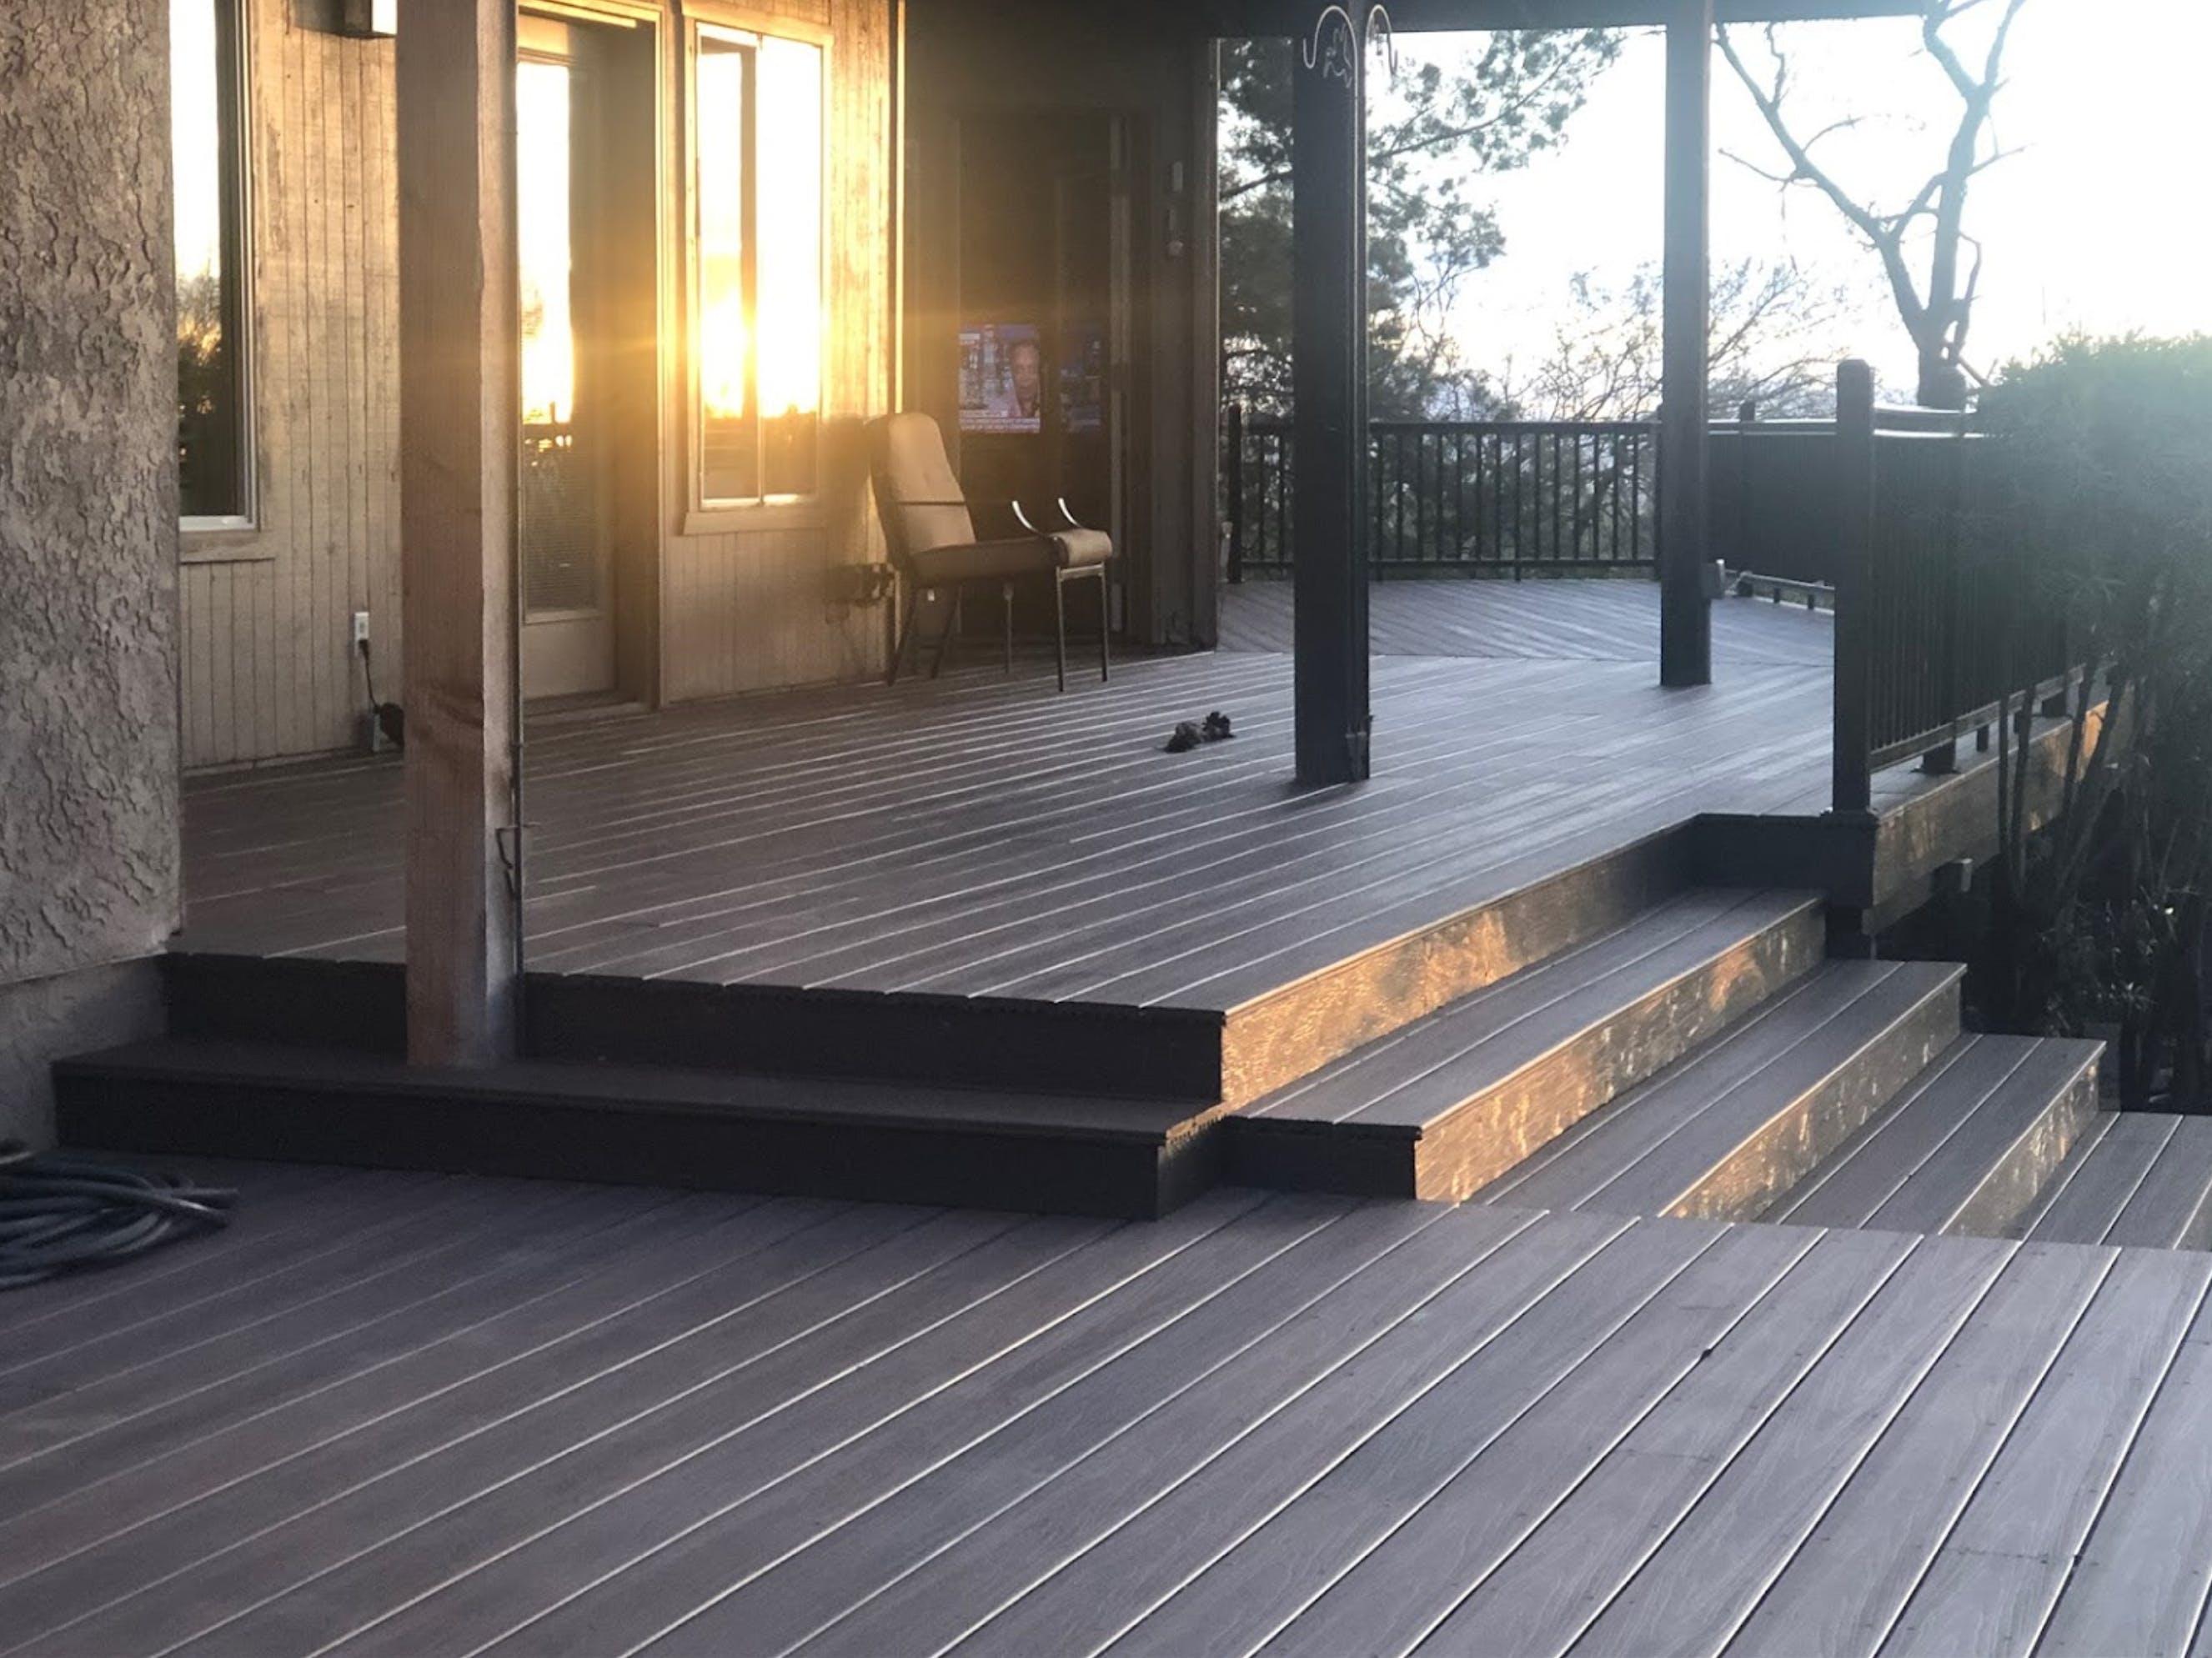 Bear Down Builders build a full length, multi-level composite deck